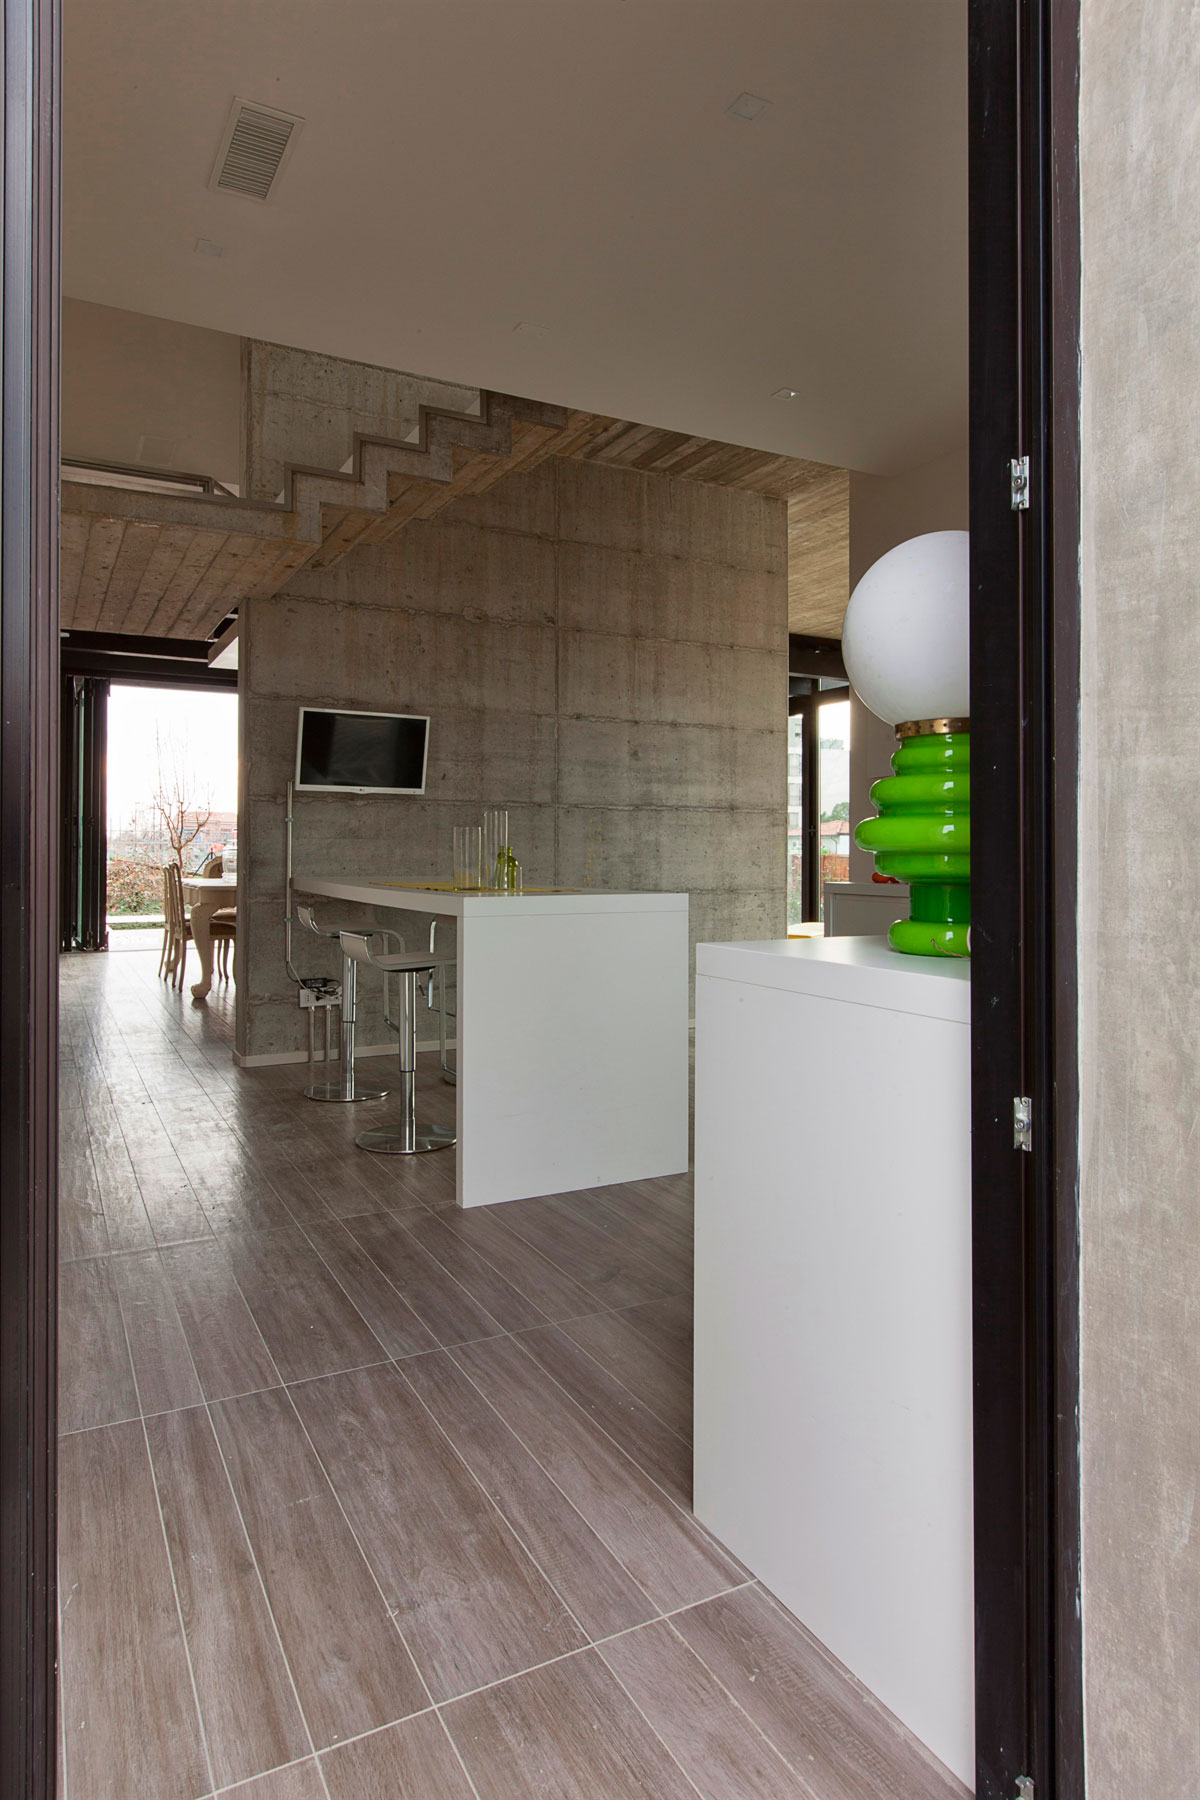 D'Autore Residence near Bologna by Giraldi Associati Architetti-18